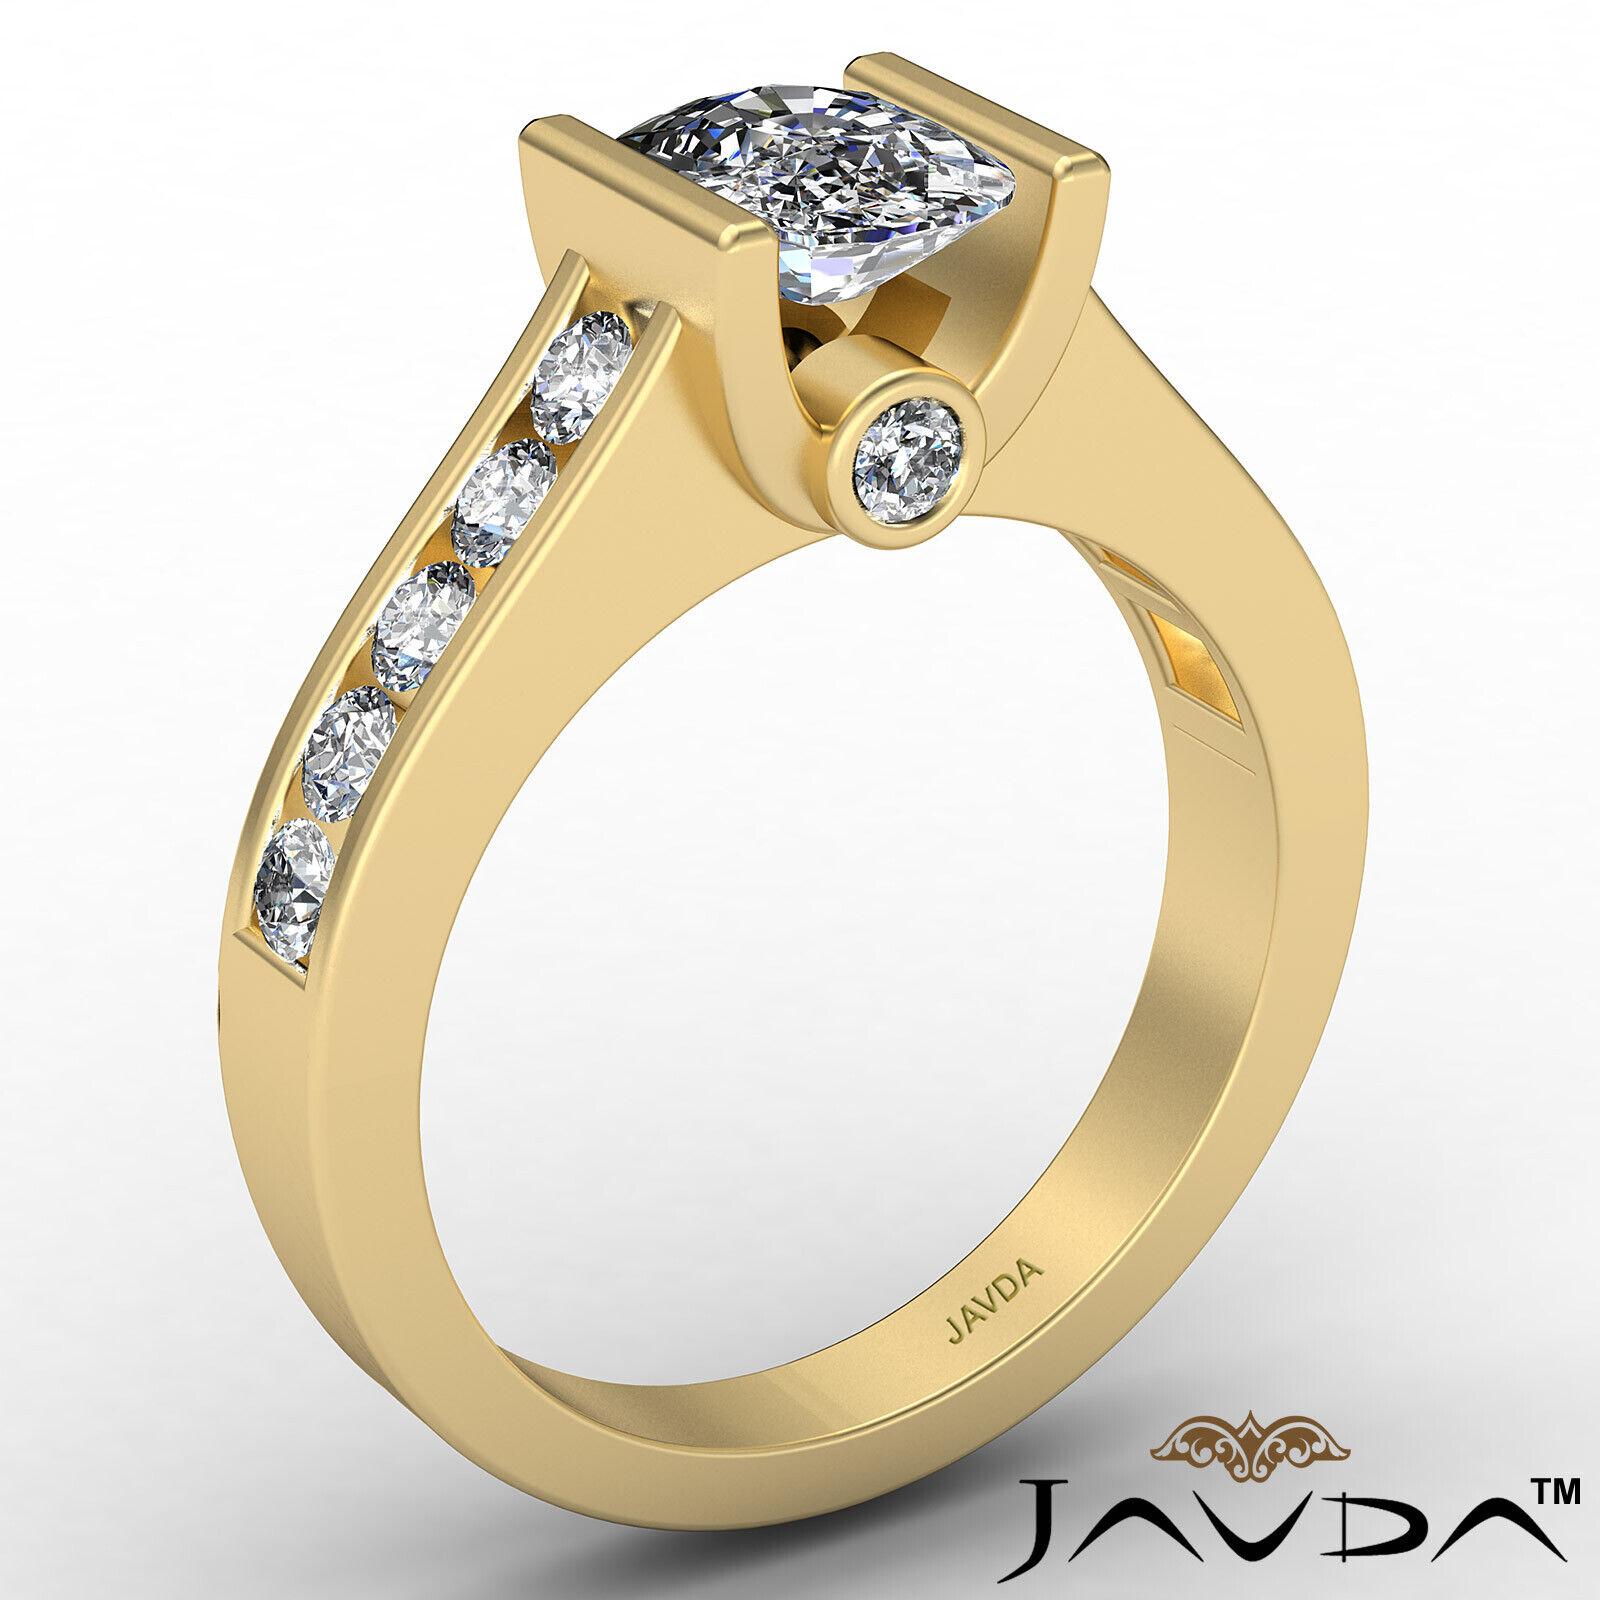 Bezel Cushion Diamond Engagement Women's Ring GIA, J Color SI1 clarity 1.53 ctw. 4